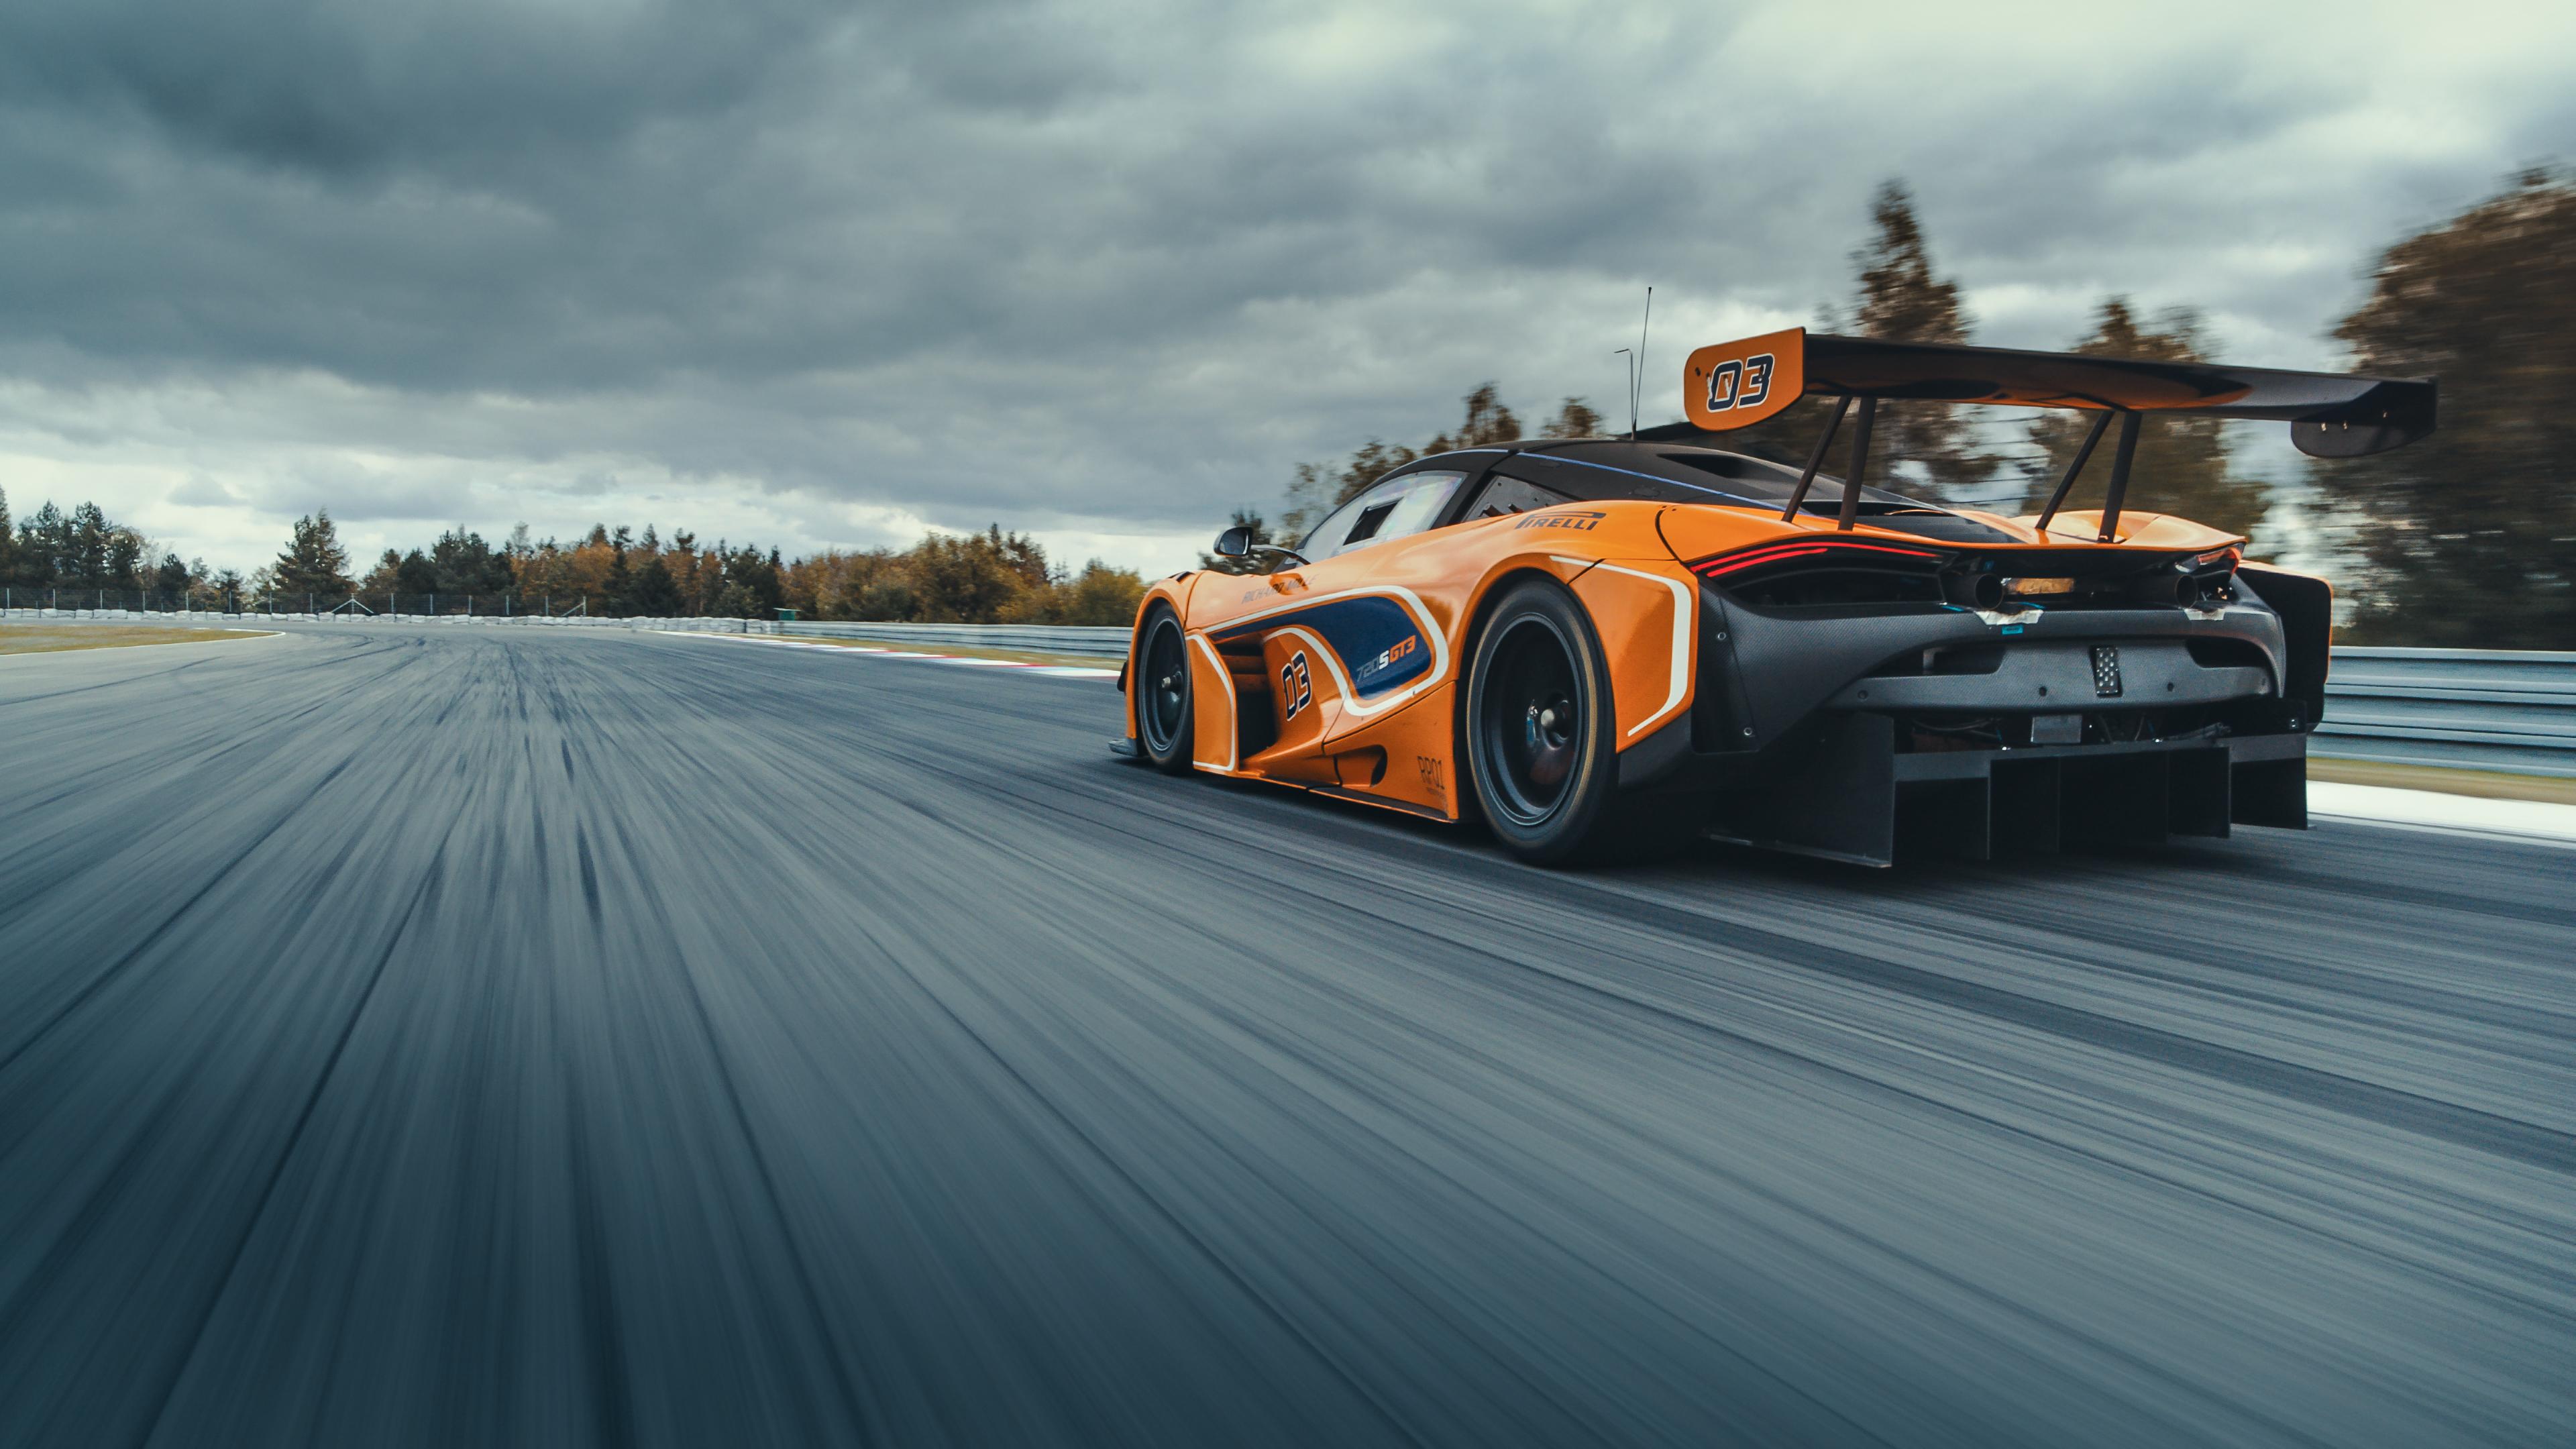 McLaren 720S GT3 4K 2019 Wallpaper | HD Car Wallpapers ...